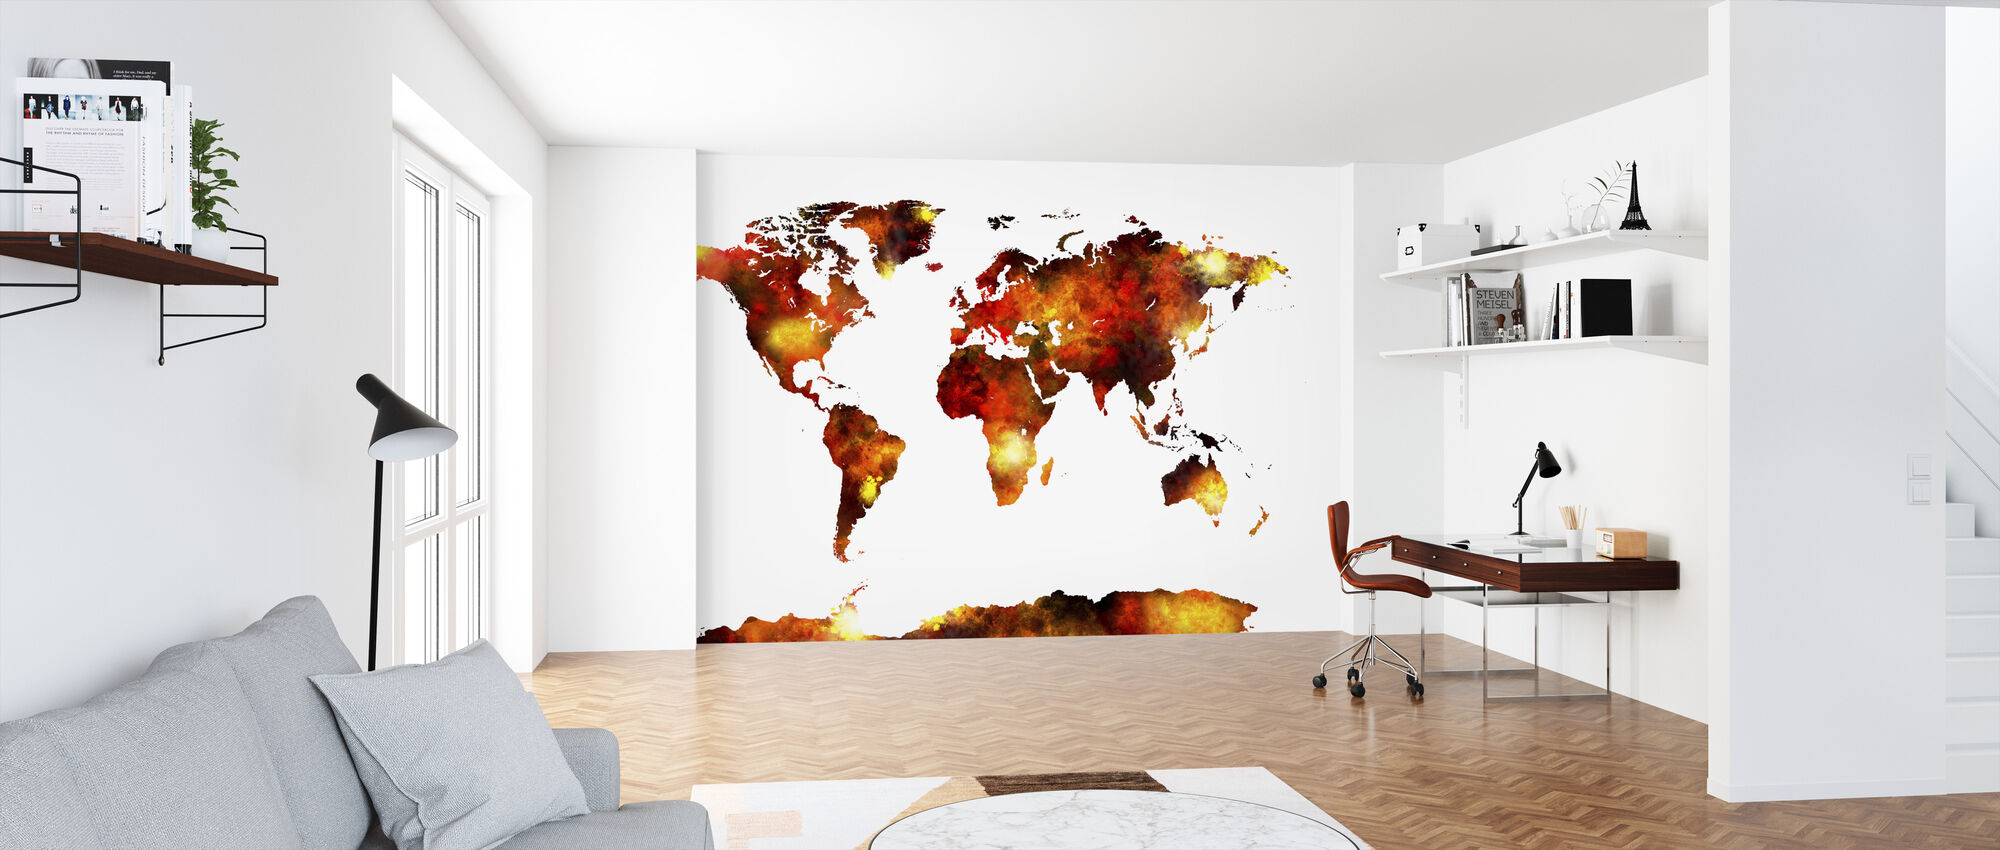 Watercolour World Map Orange - Wallpaper - Office